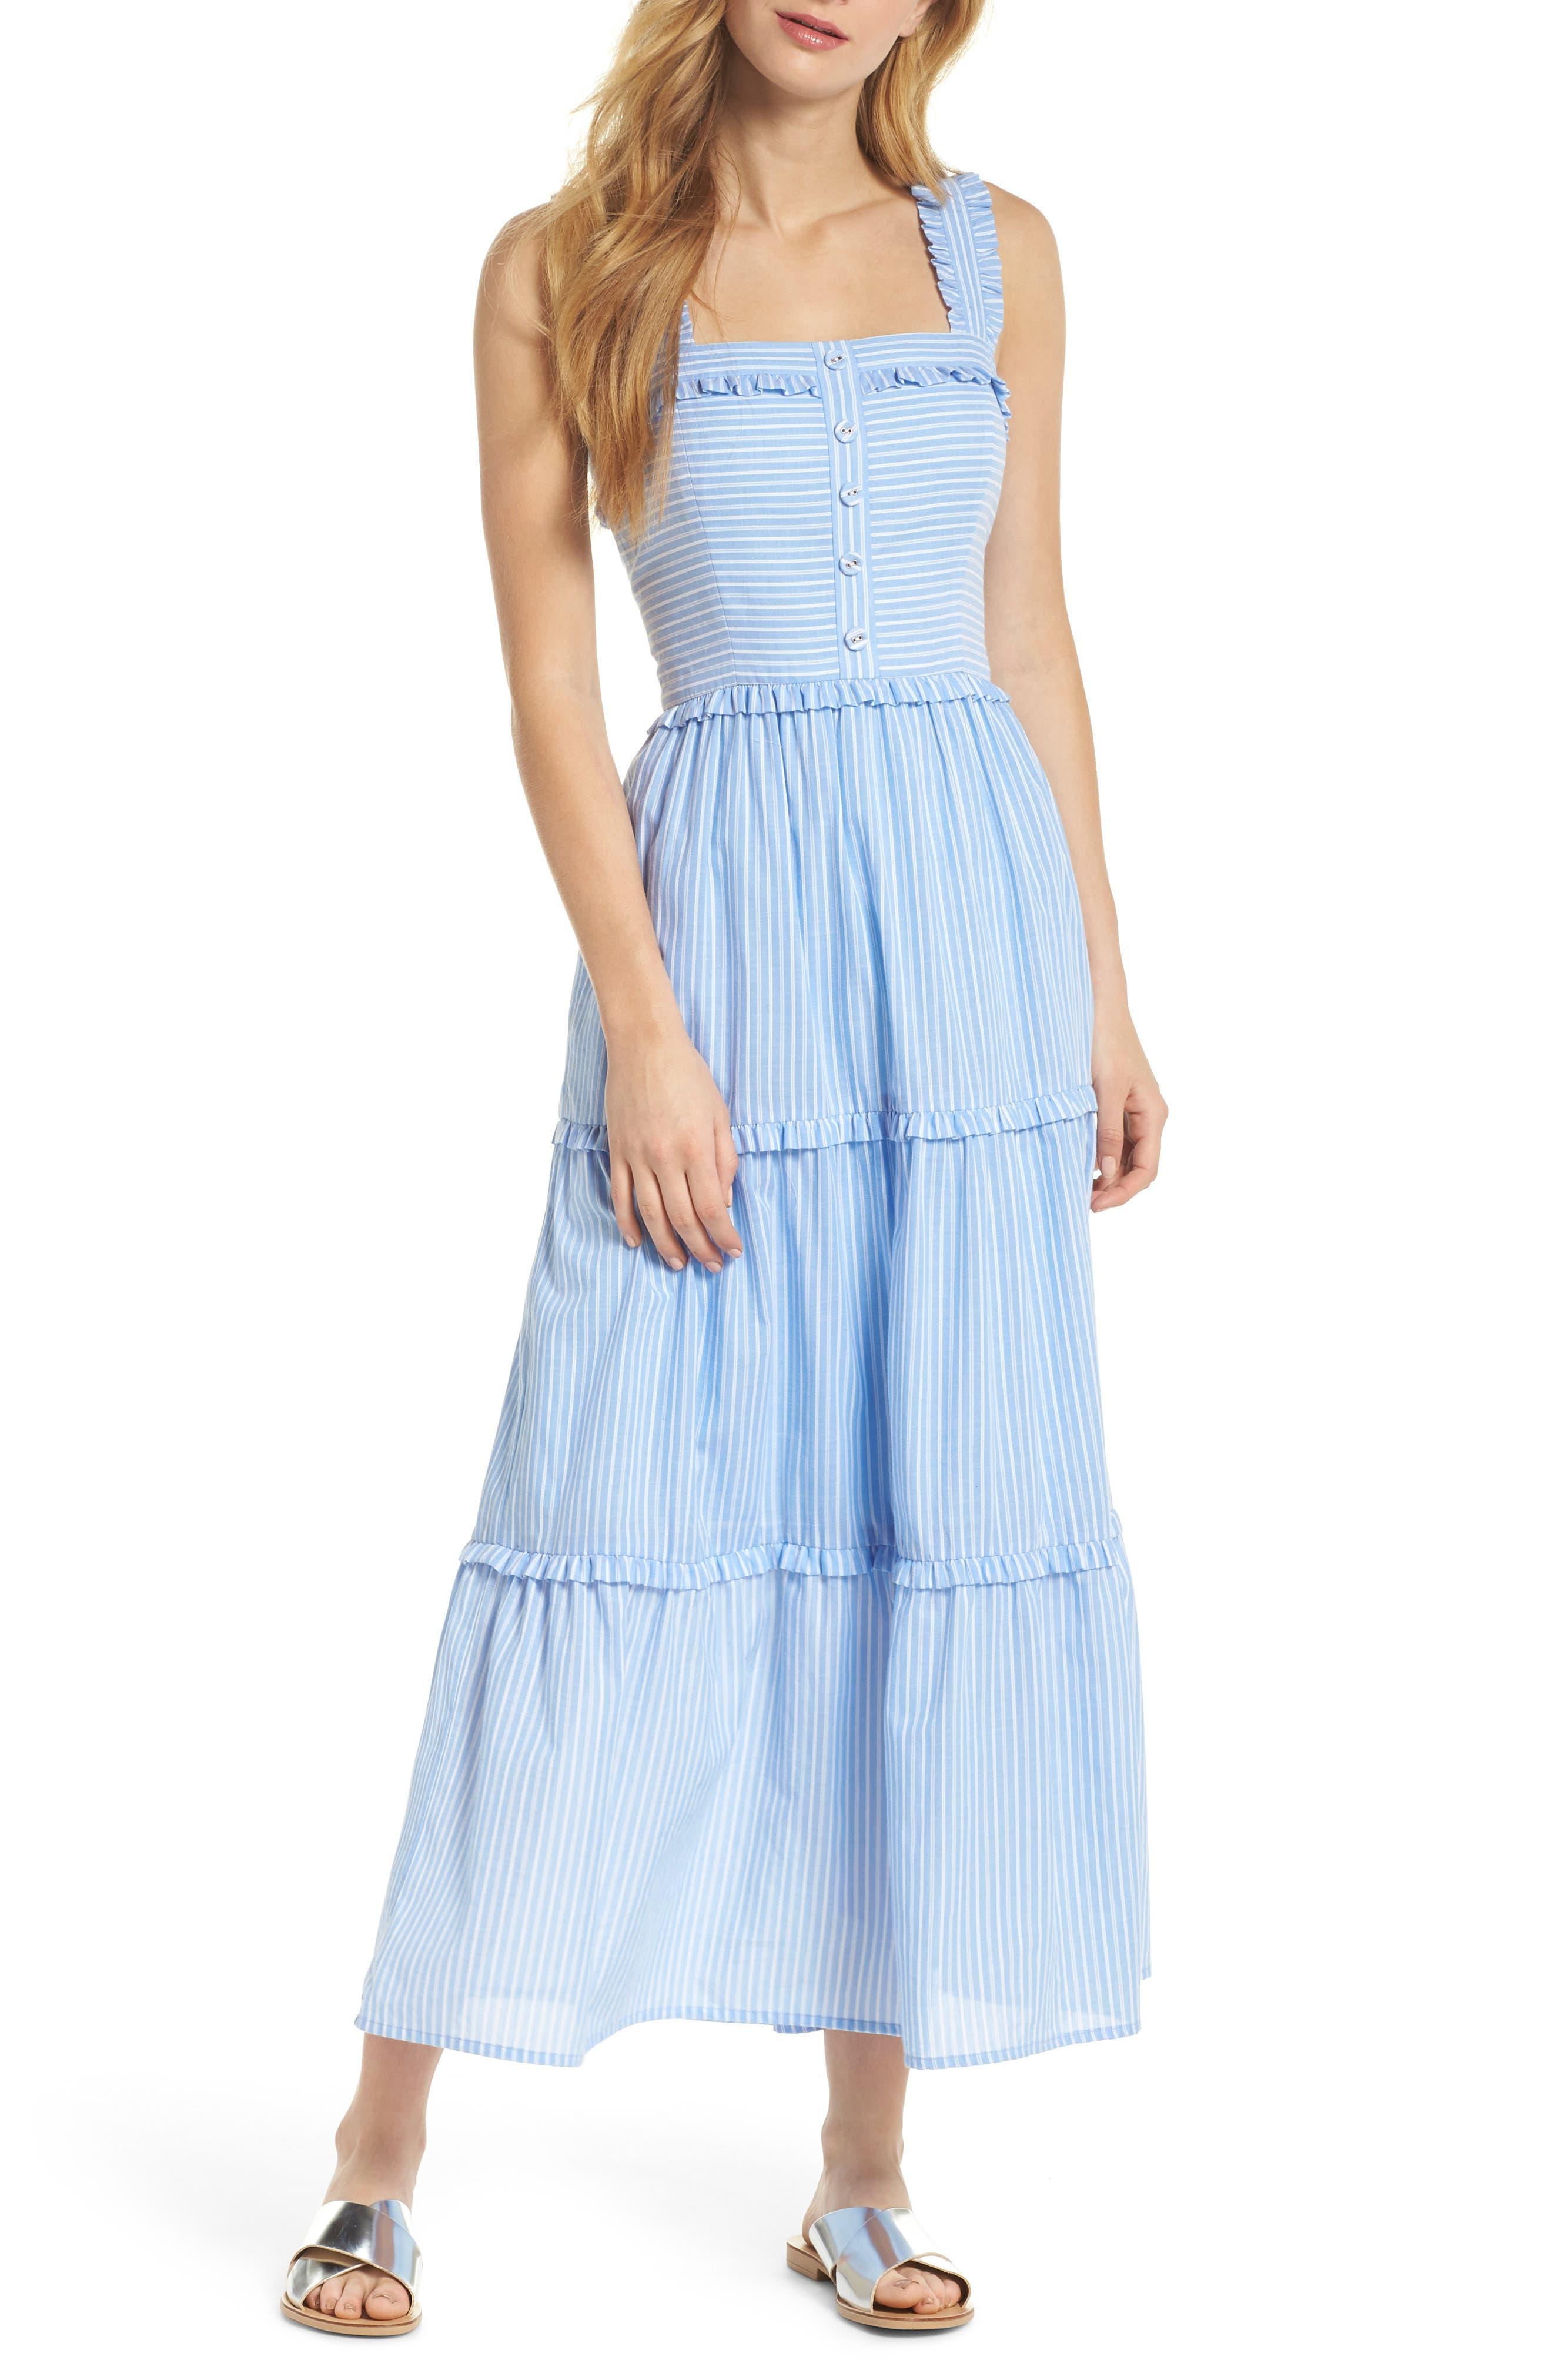 Courtney Rio Stripe Lawn Maxi Dress,                             Main thumbnail 1, color,                             Blue/ White